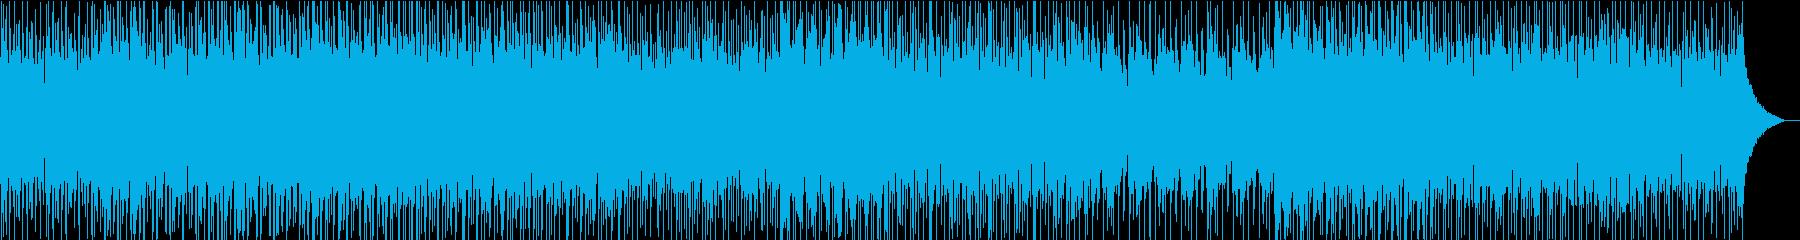 J−POPな曲調のBGMの再生済みの波形